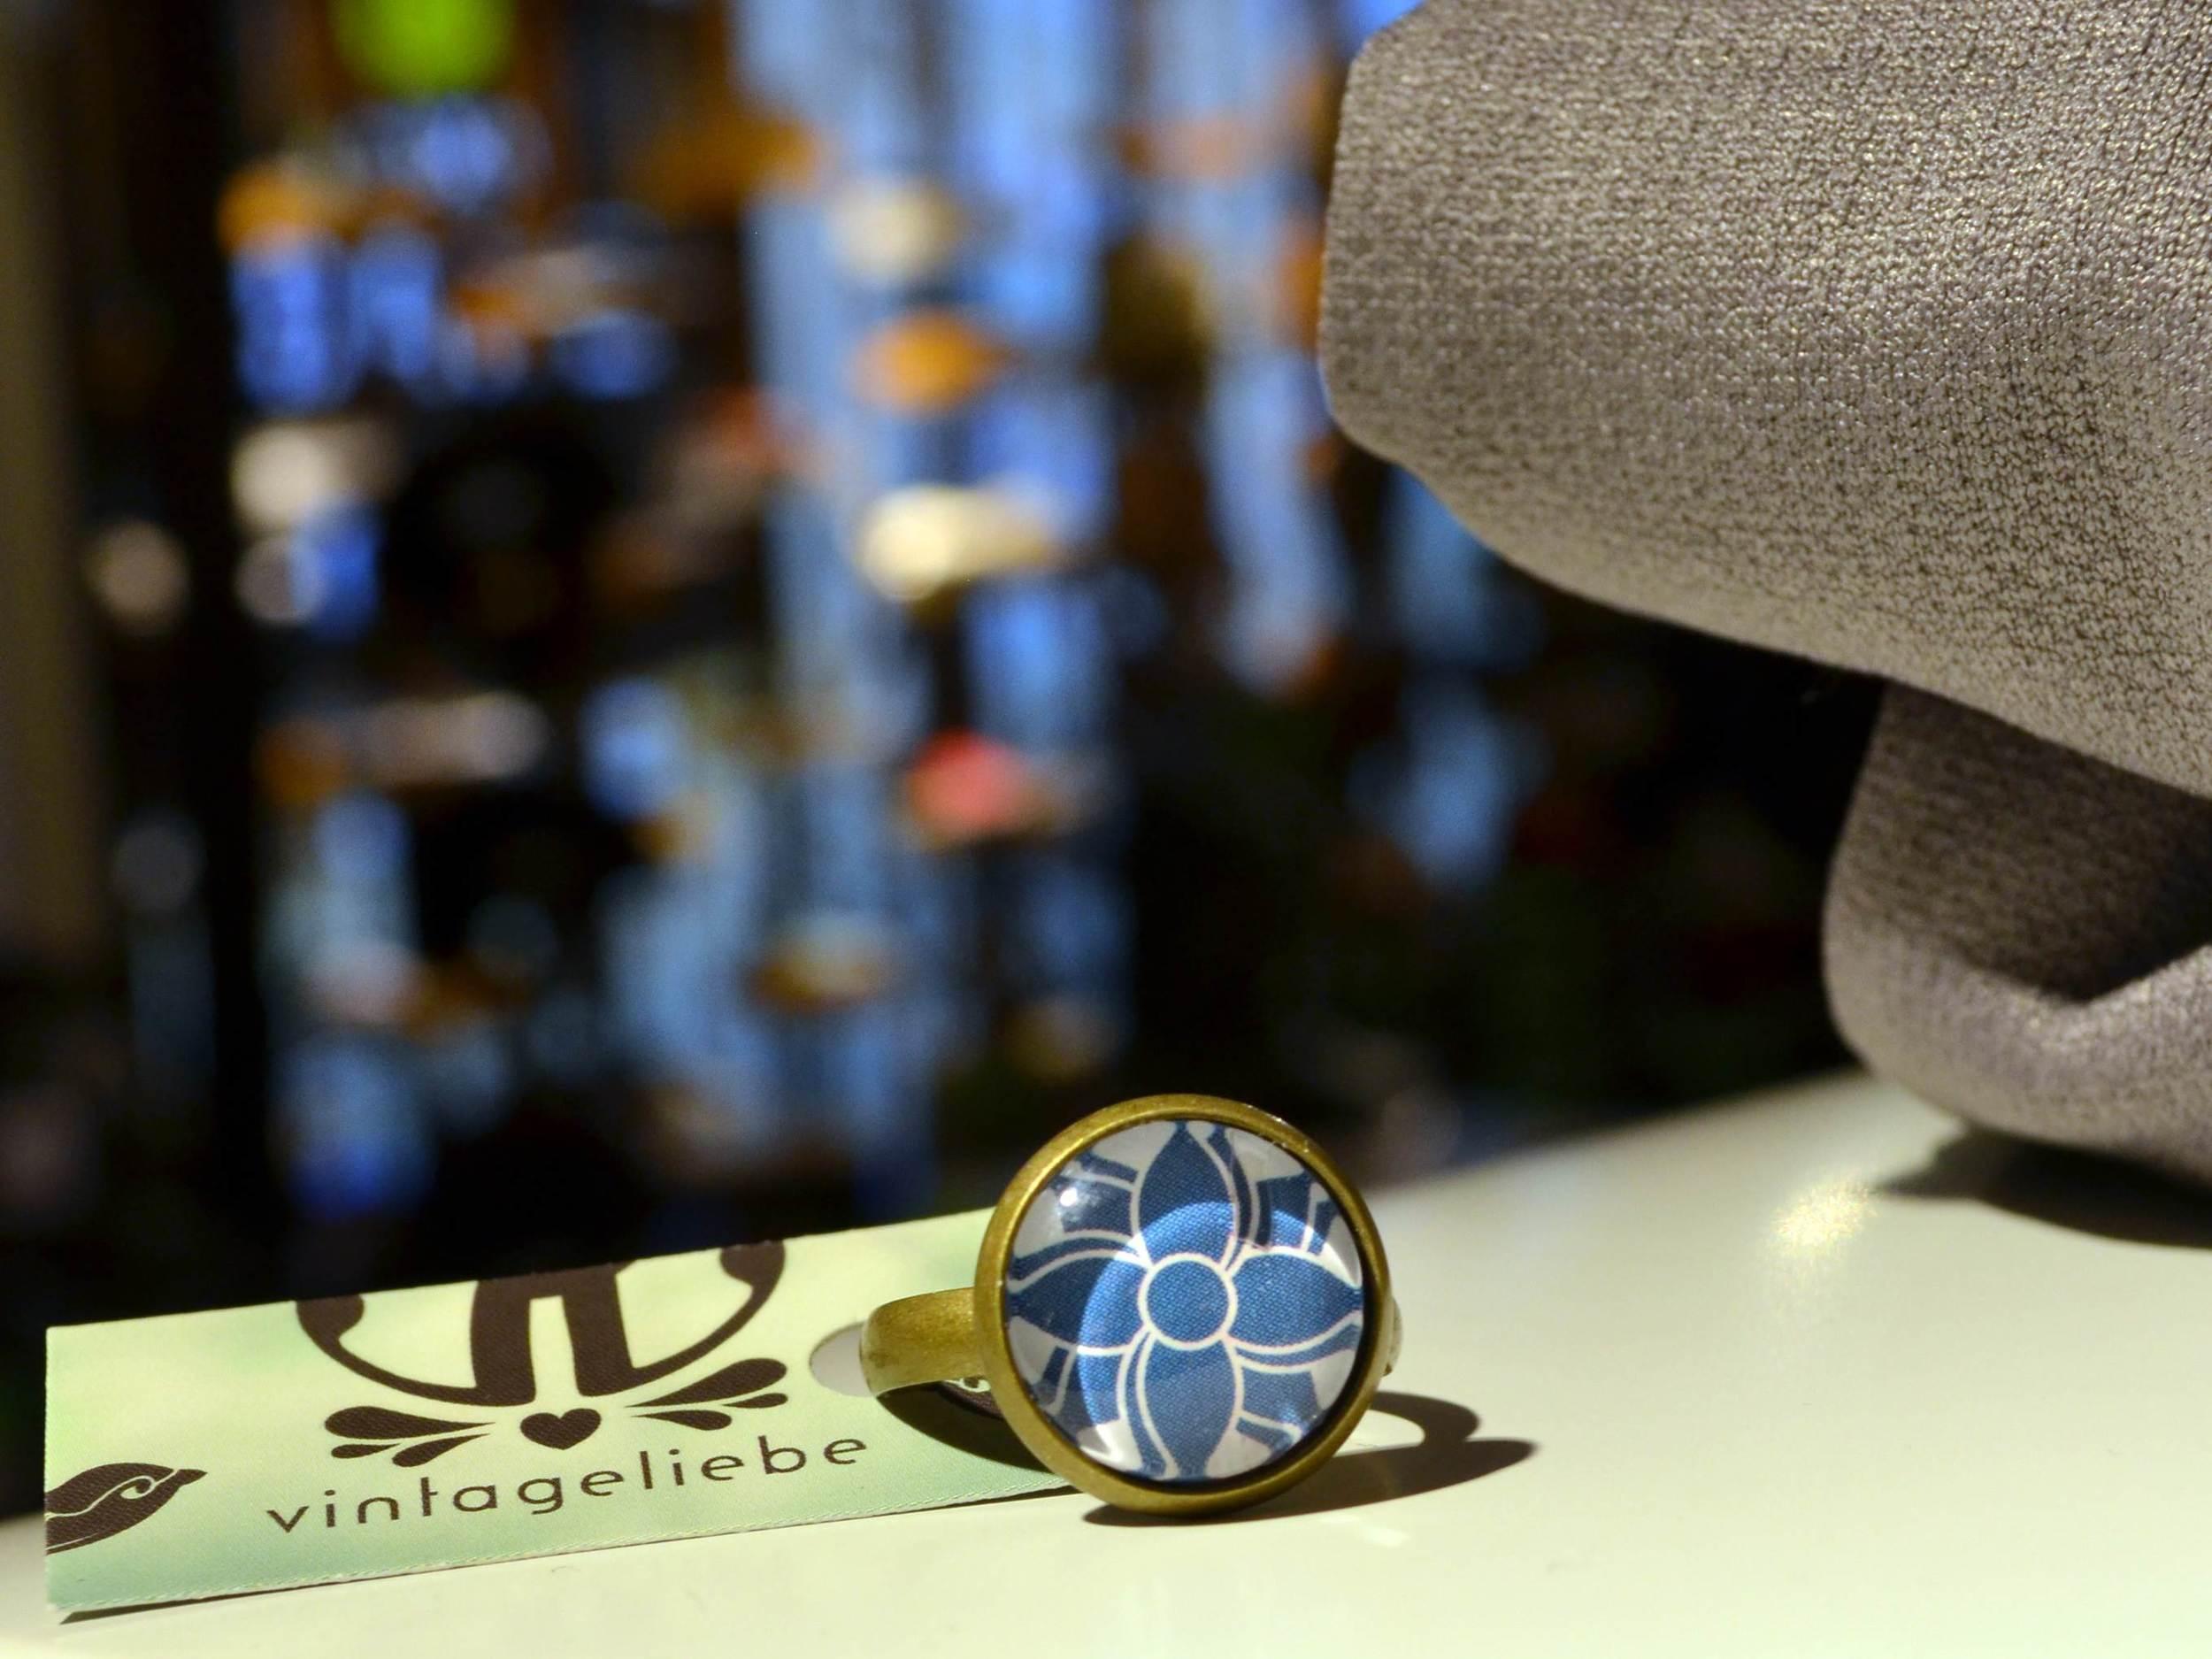 10_Quiksilver-Flensburg_Ring-Bluete-web.JPG